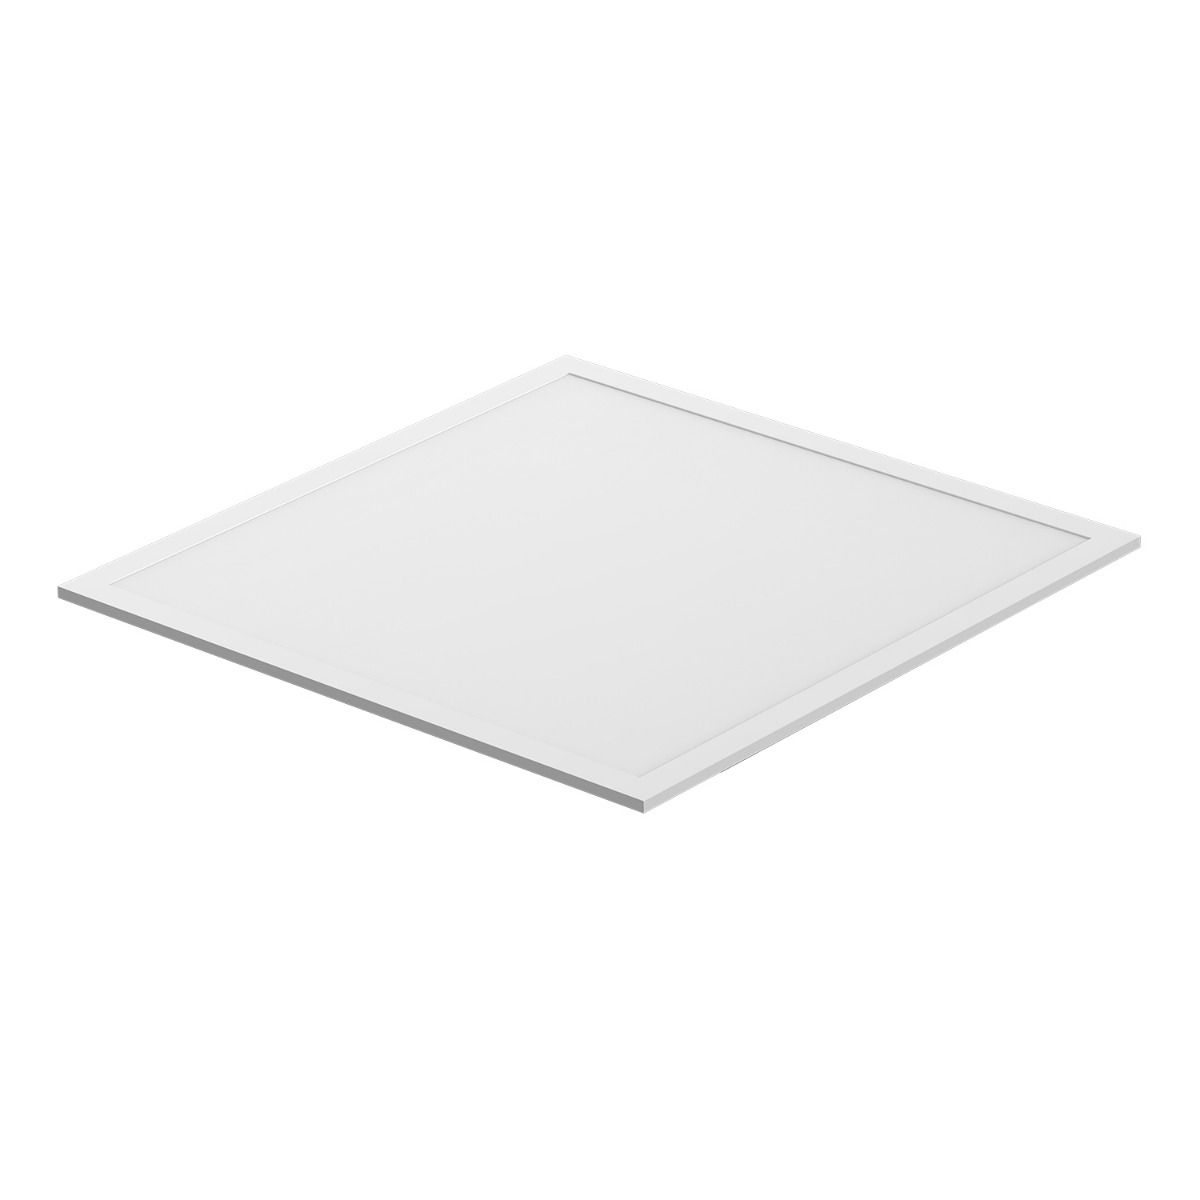 Panel LED Noxion Delta Pro V2.0 Xitanium DALI 30W 60x60cm 6500K 4110lm UGR